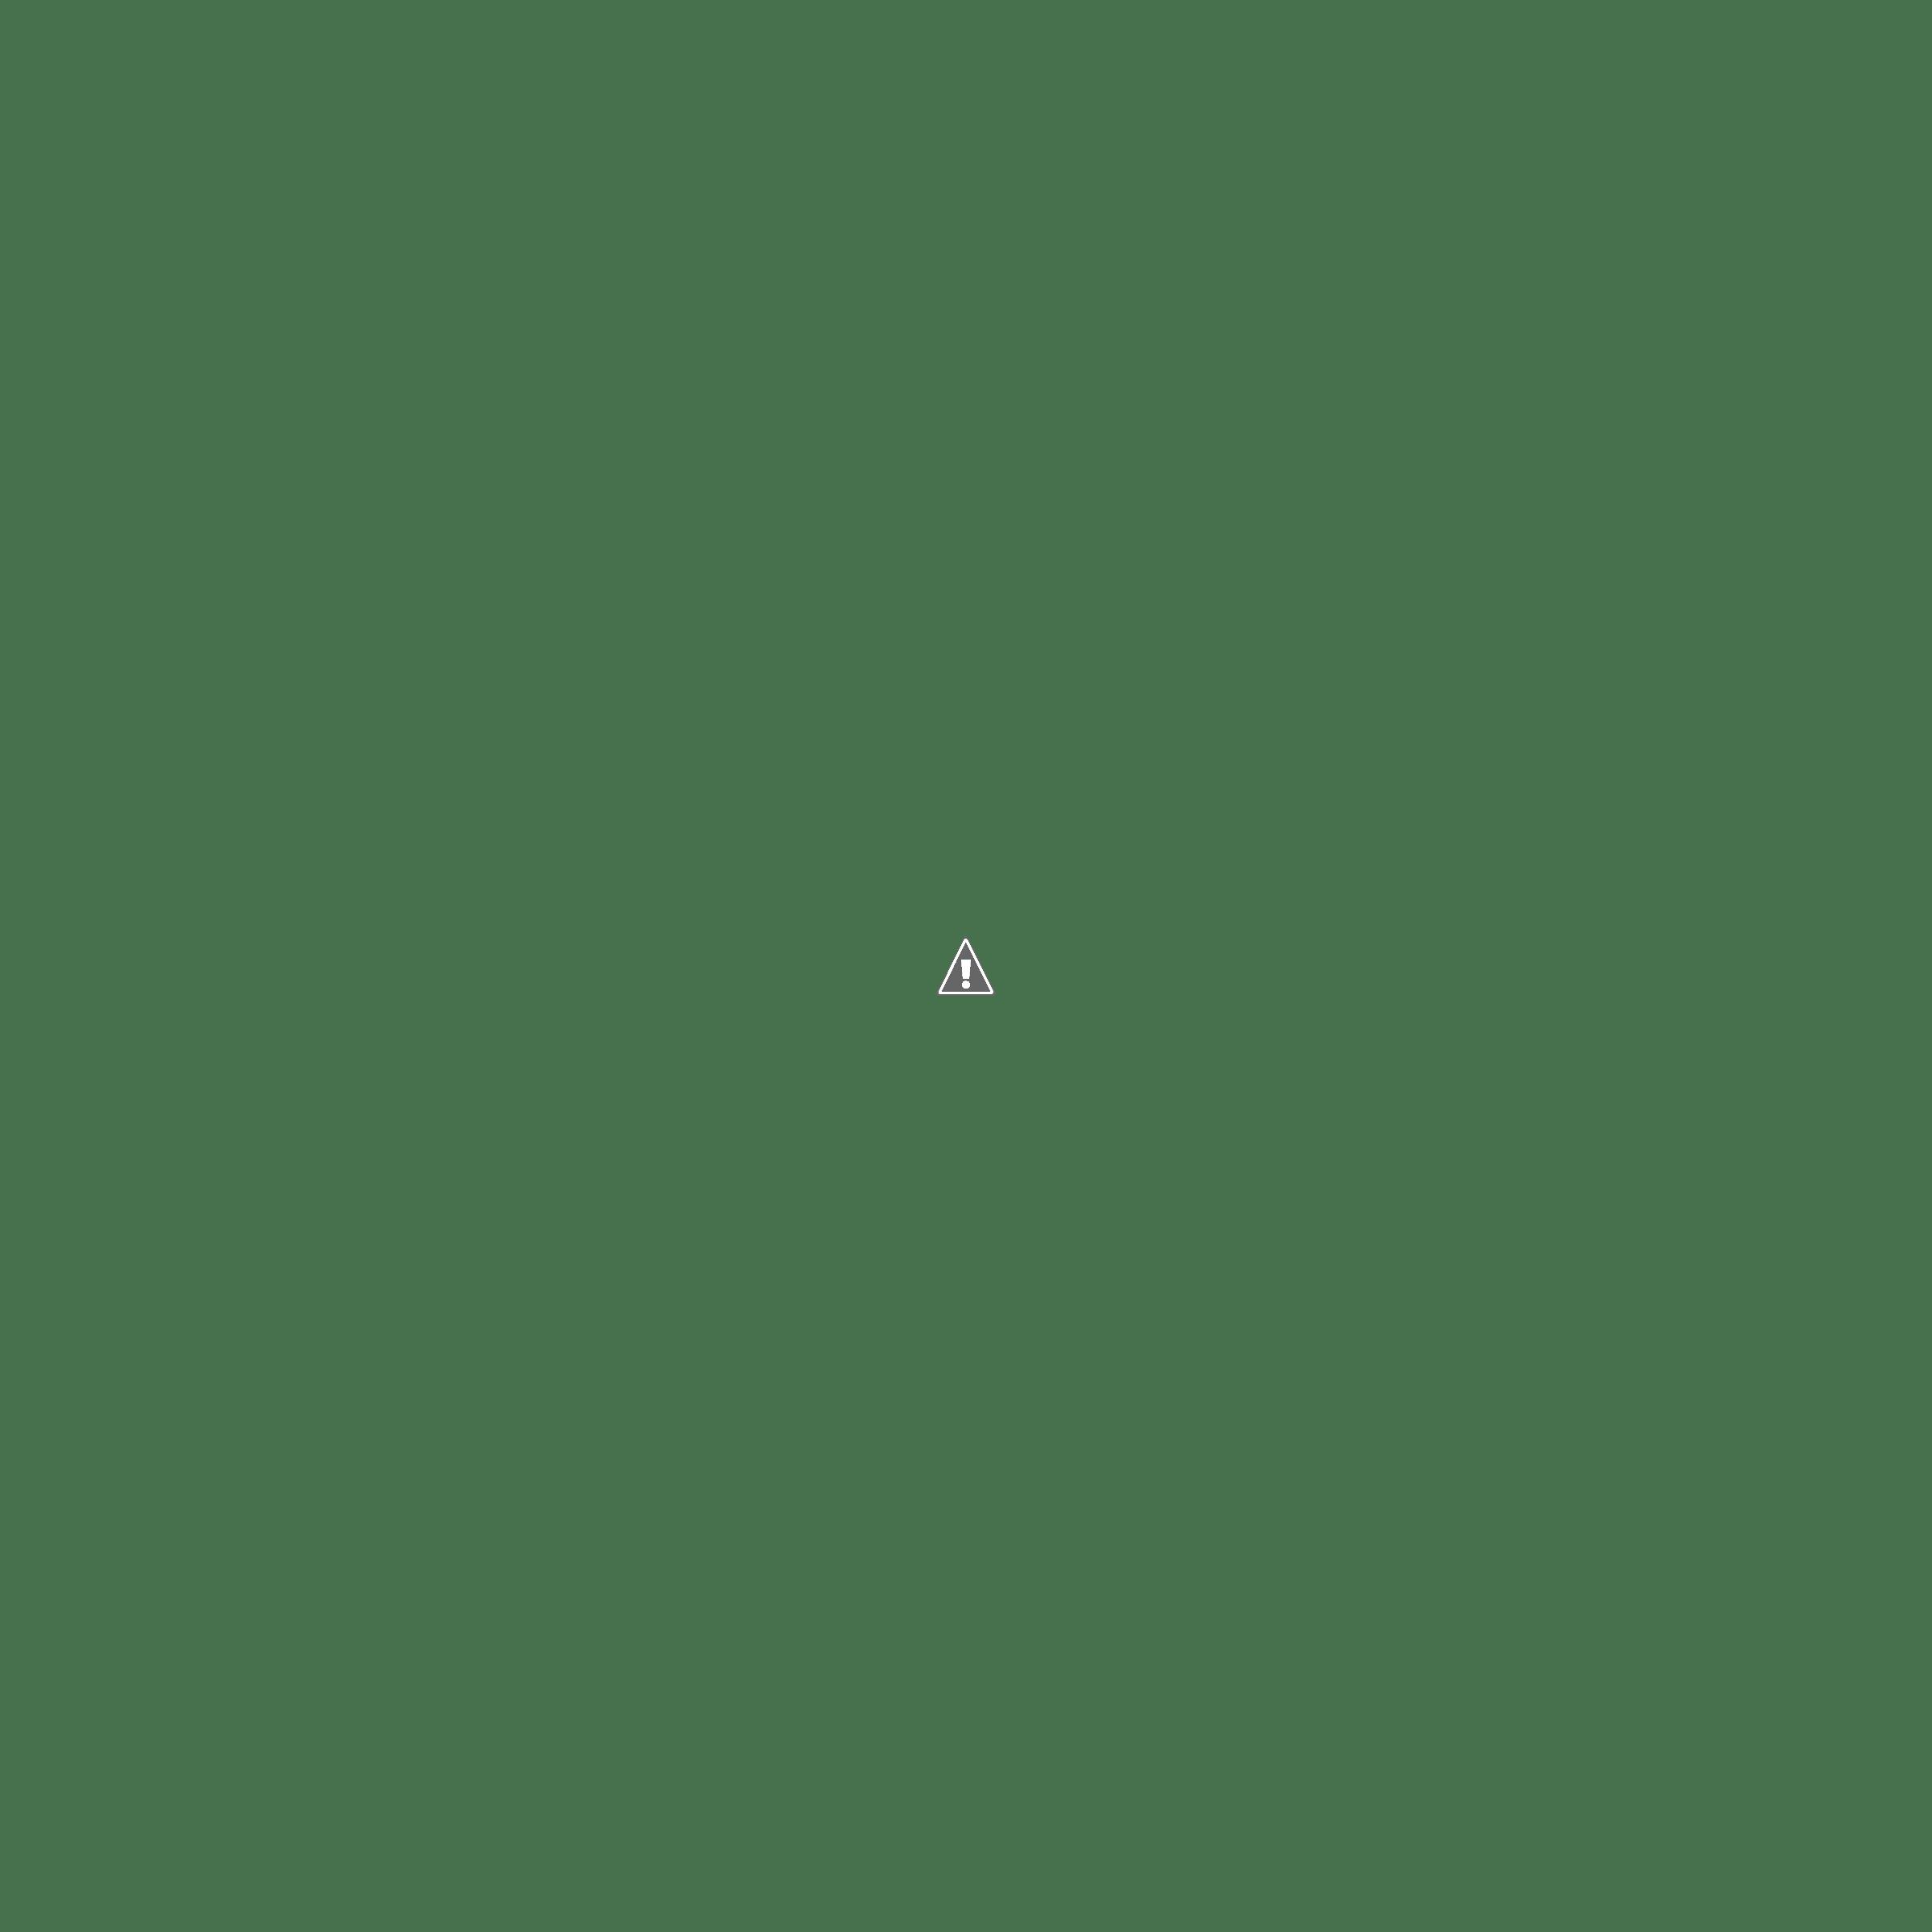 Unlearning - Single by Teddy Swims | Spotify